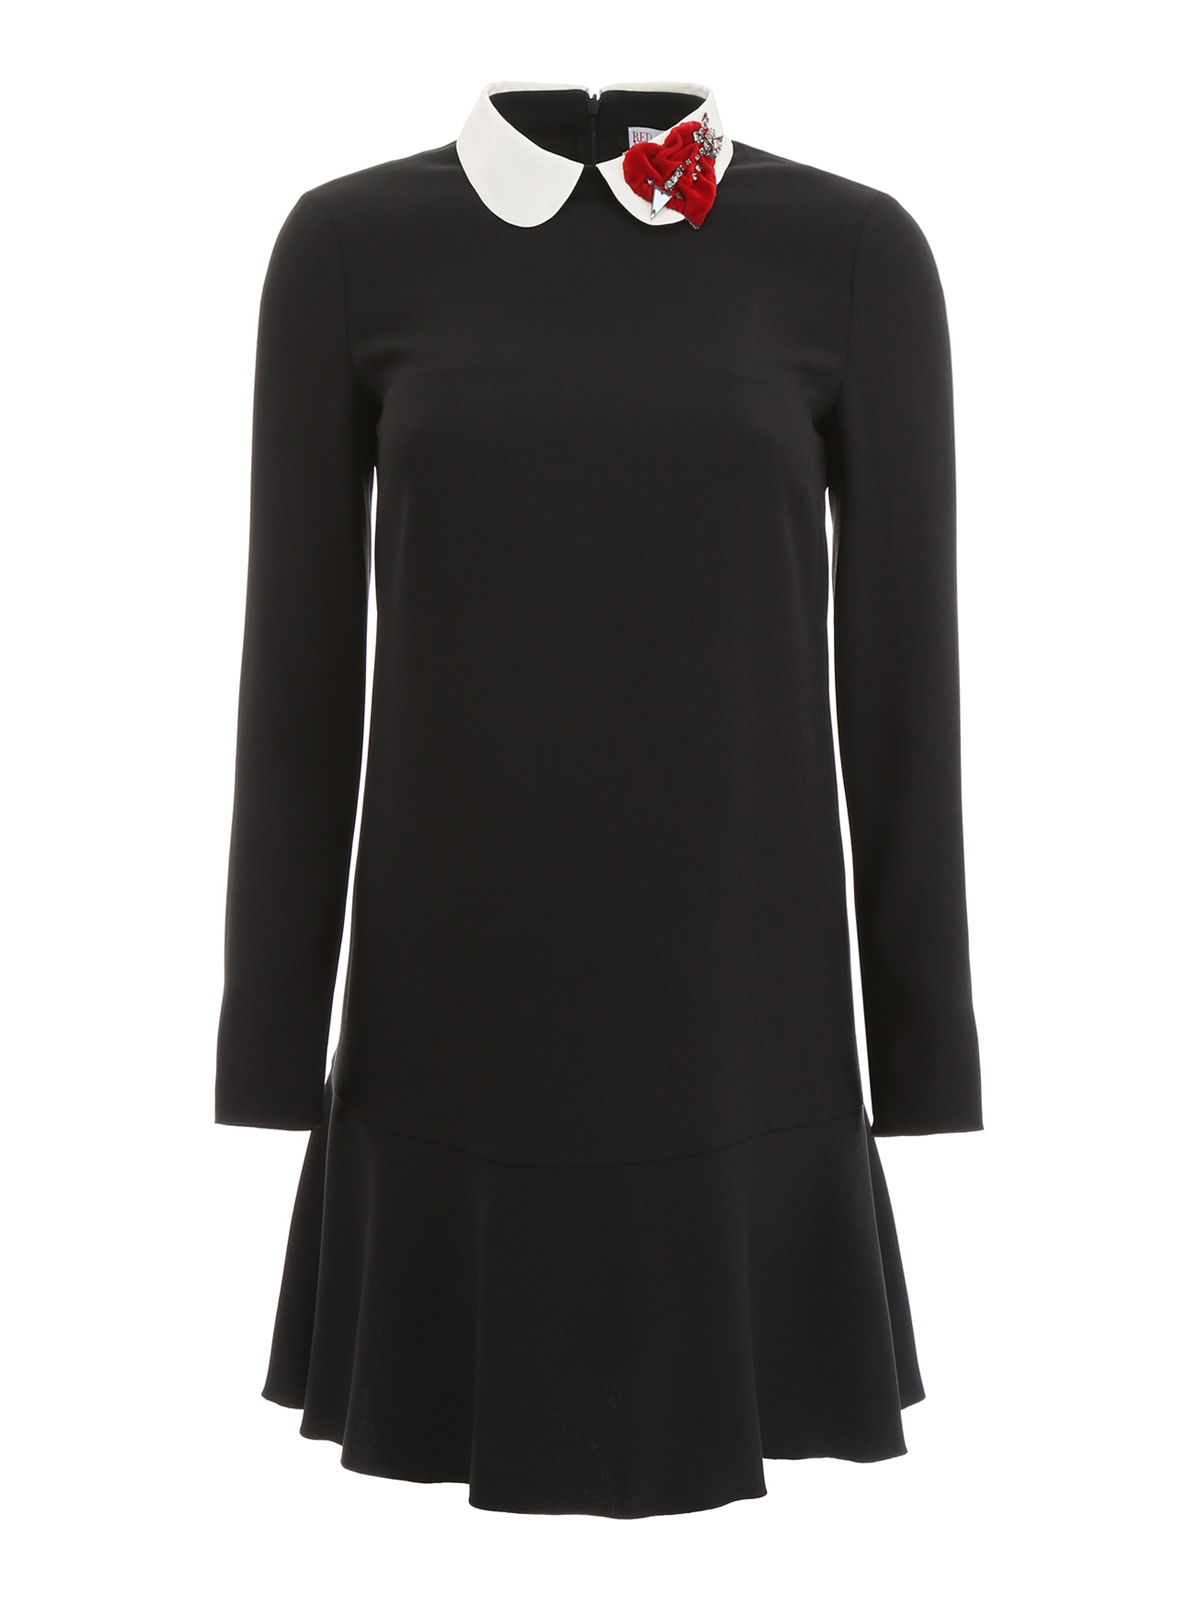 Valentino Red - Heart patch detail preppy black dress